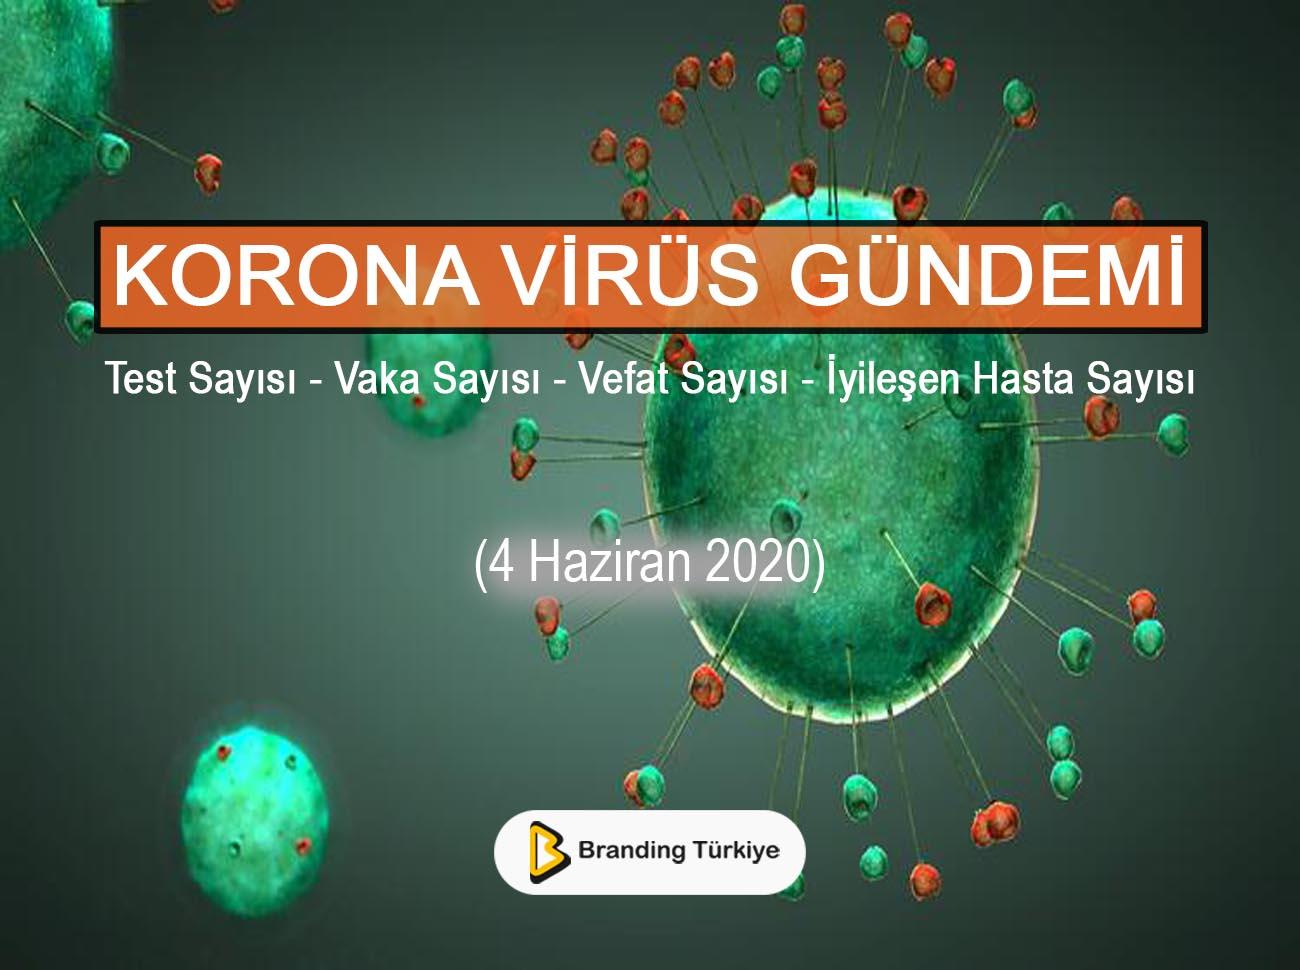 Korona Virüs Gündemi (4 Haziran 2020)